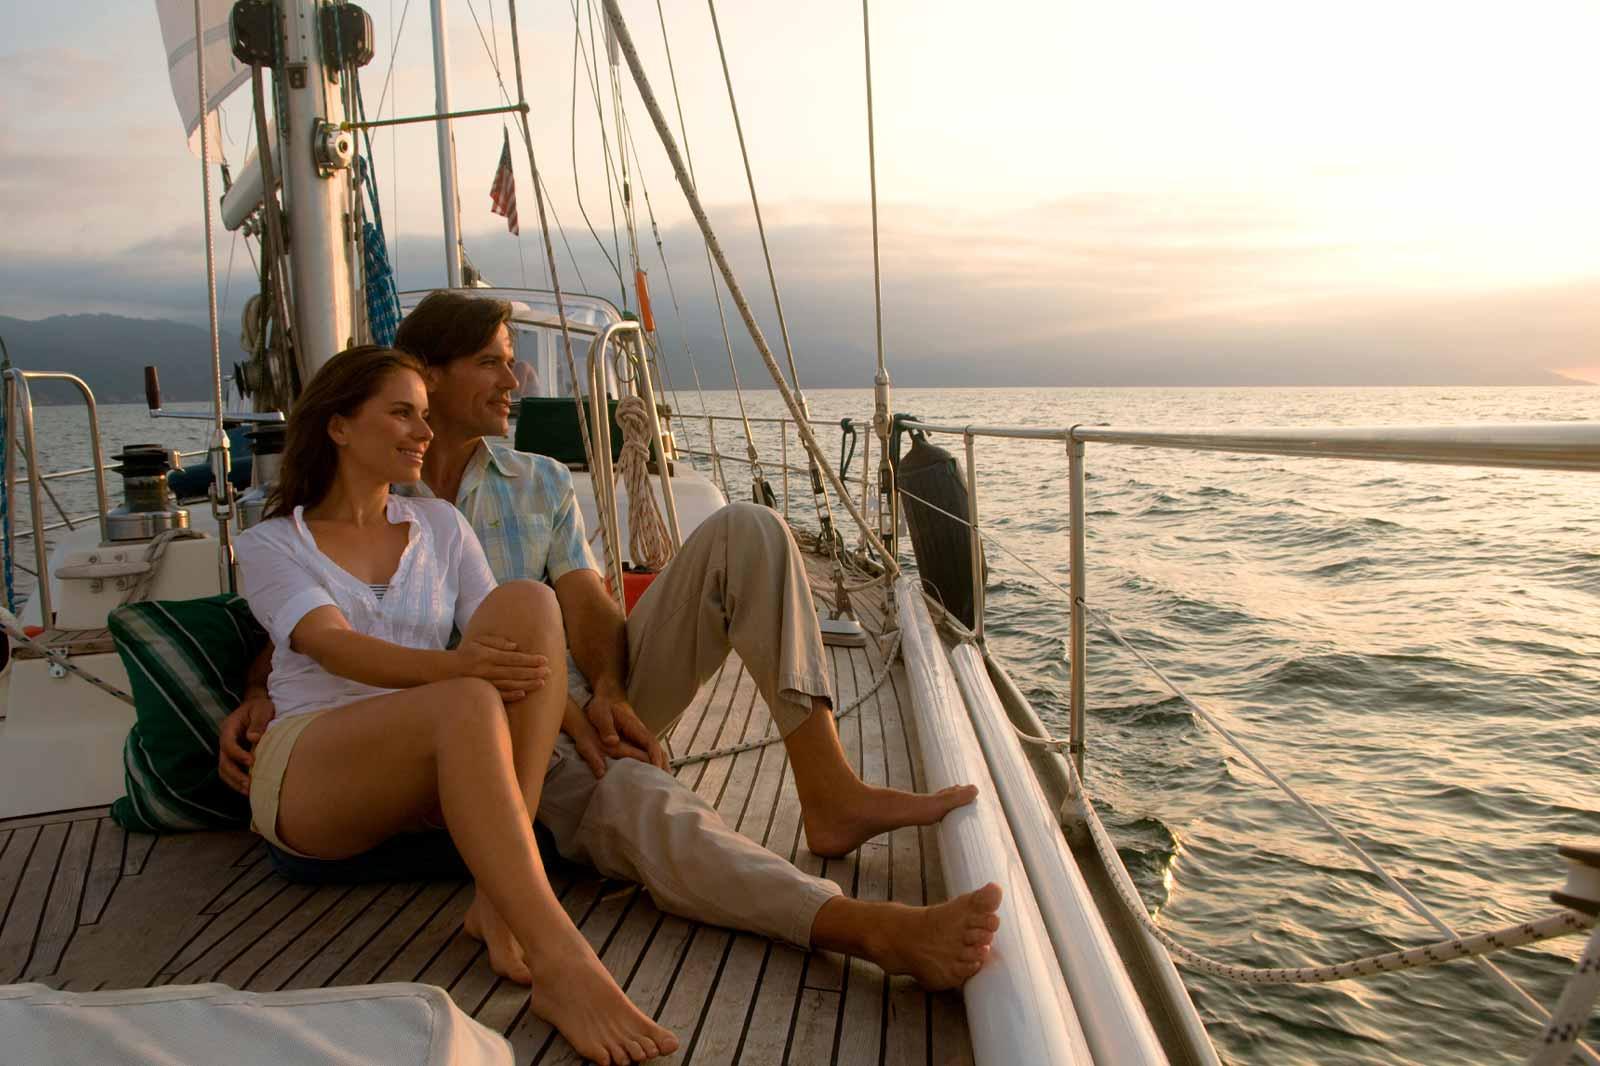 mexicofinder-travel-mexico-romantic-puerto-vallarta-catamaran